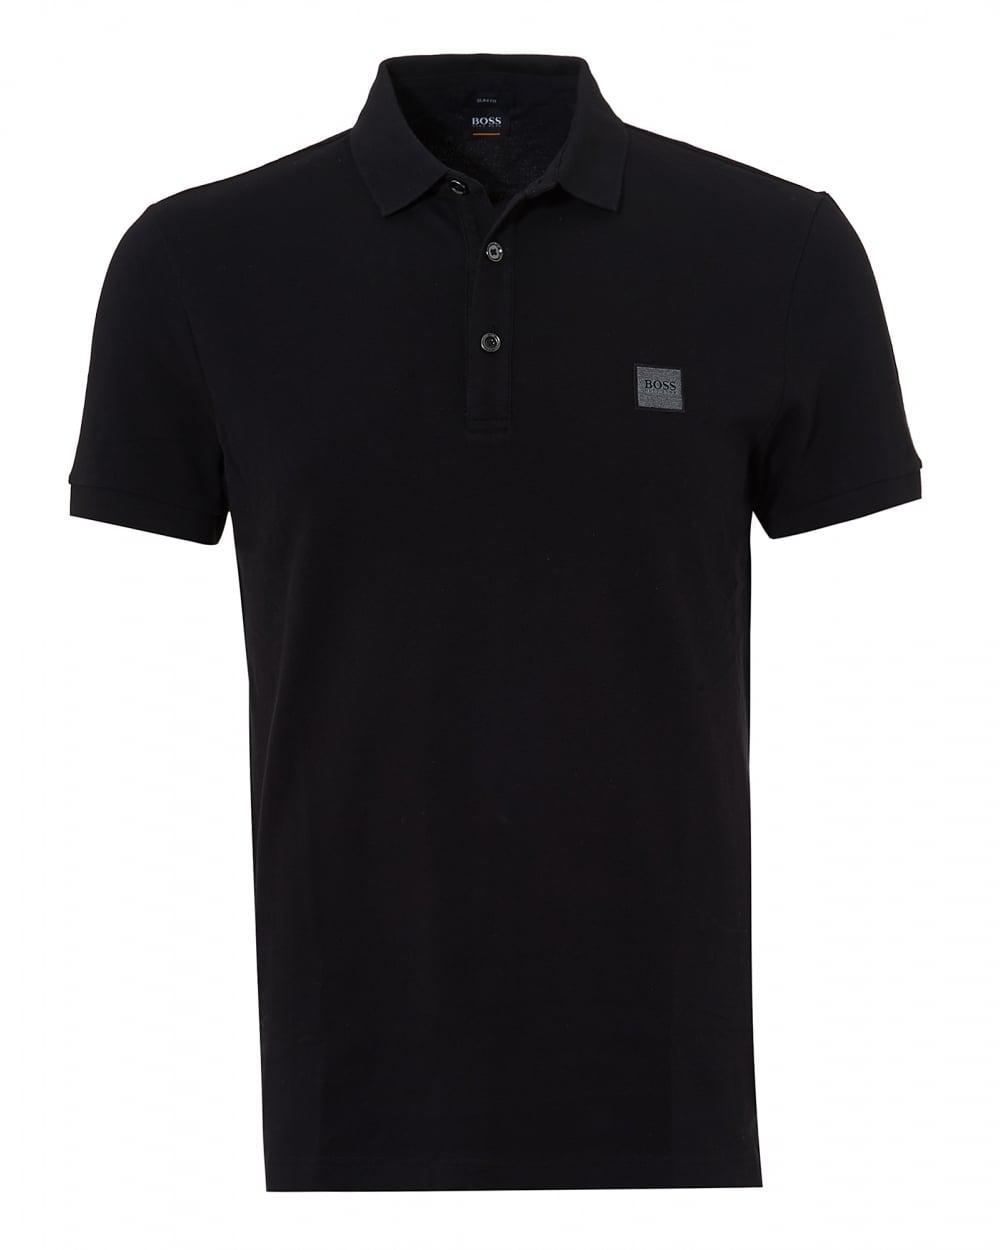 Boss orange passenger polo black short sleeve polo shirt for Orange polo shirt mens